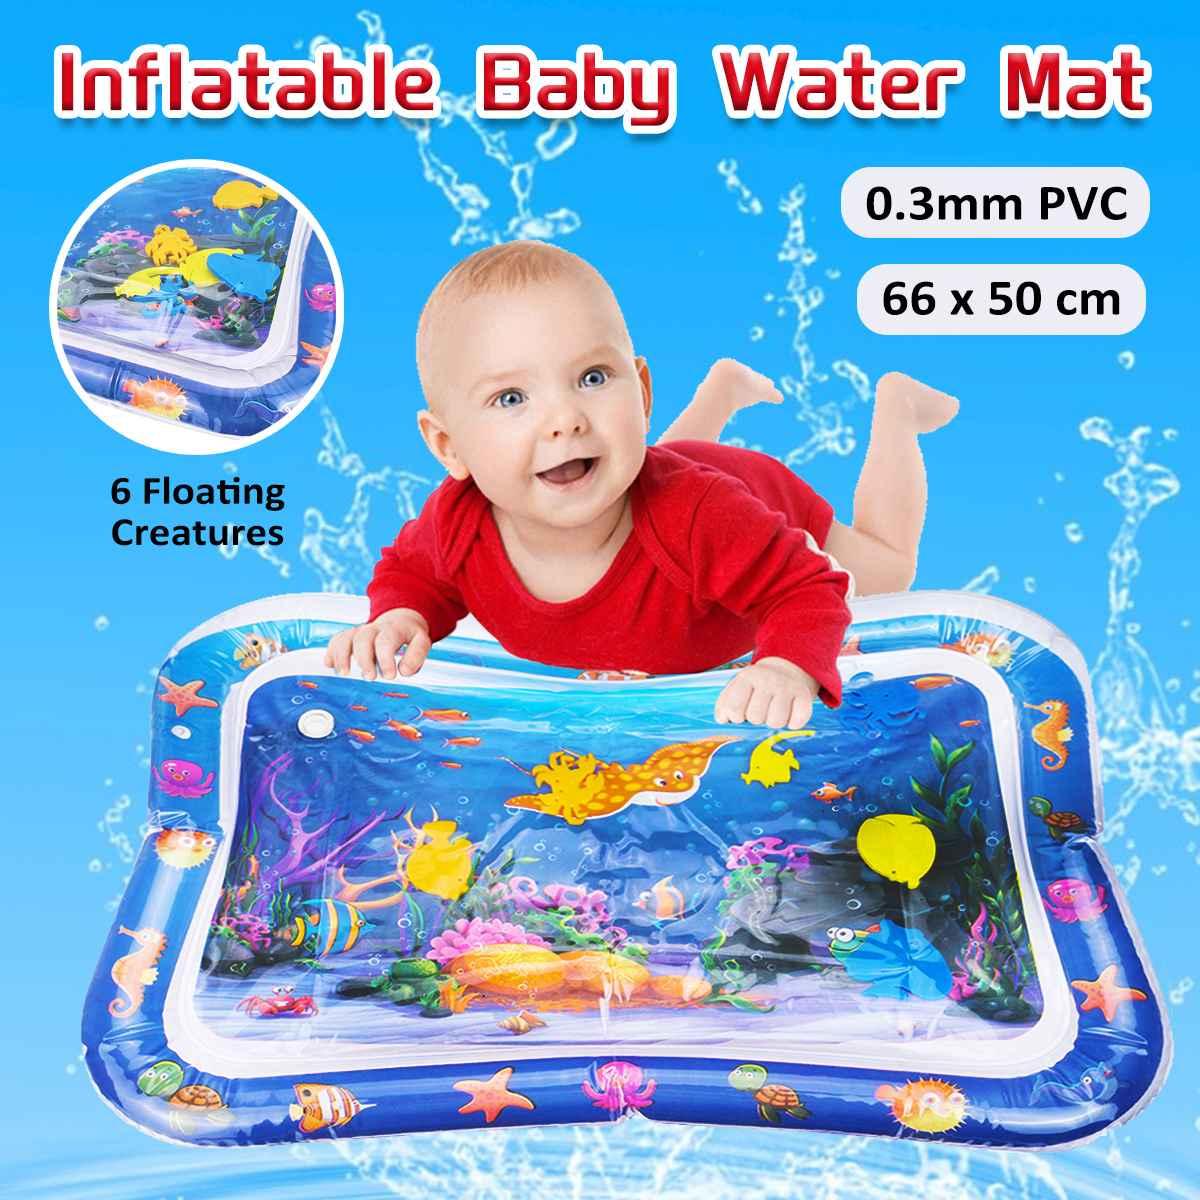 Tapete inflable para juegos de agua para bebés de 66x50cm, tapete para juegos de actividades infantiles, tapete de agua para bebés